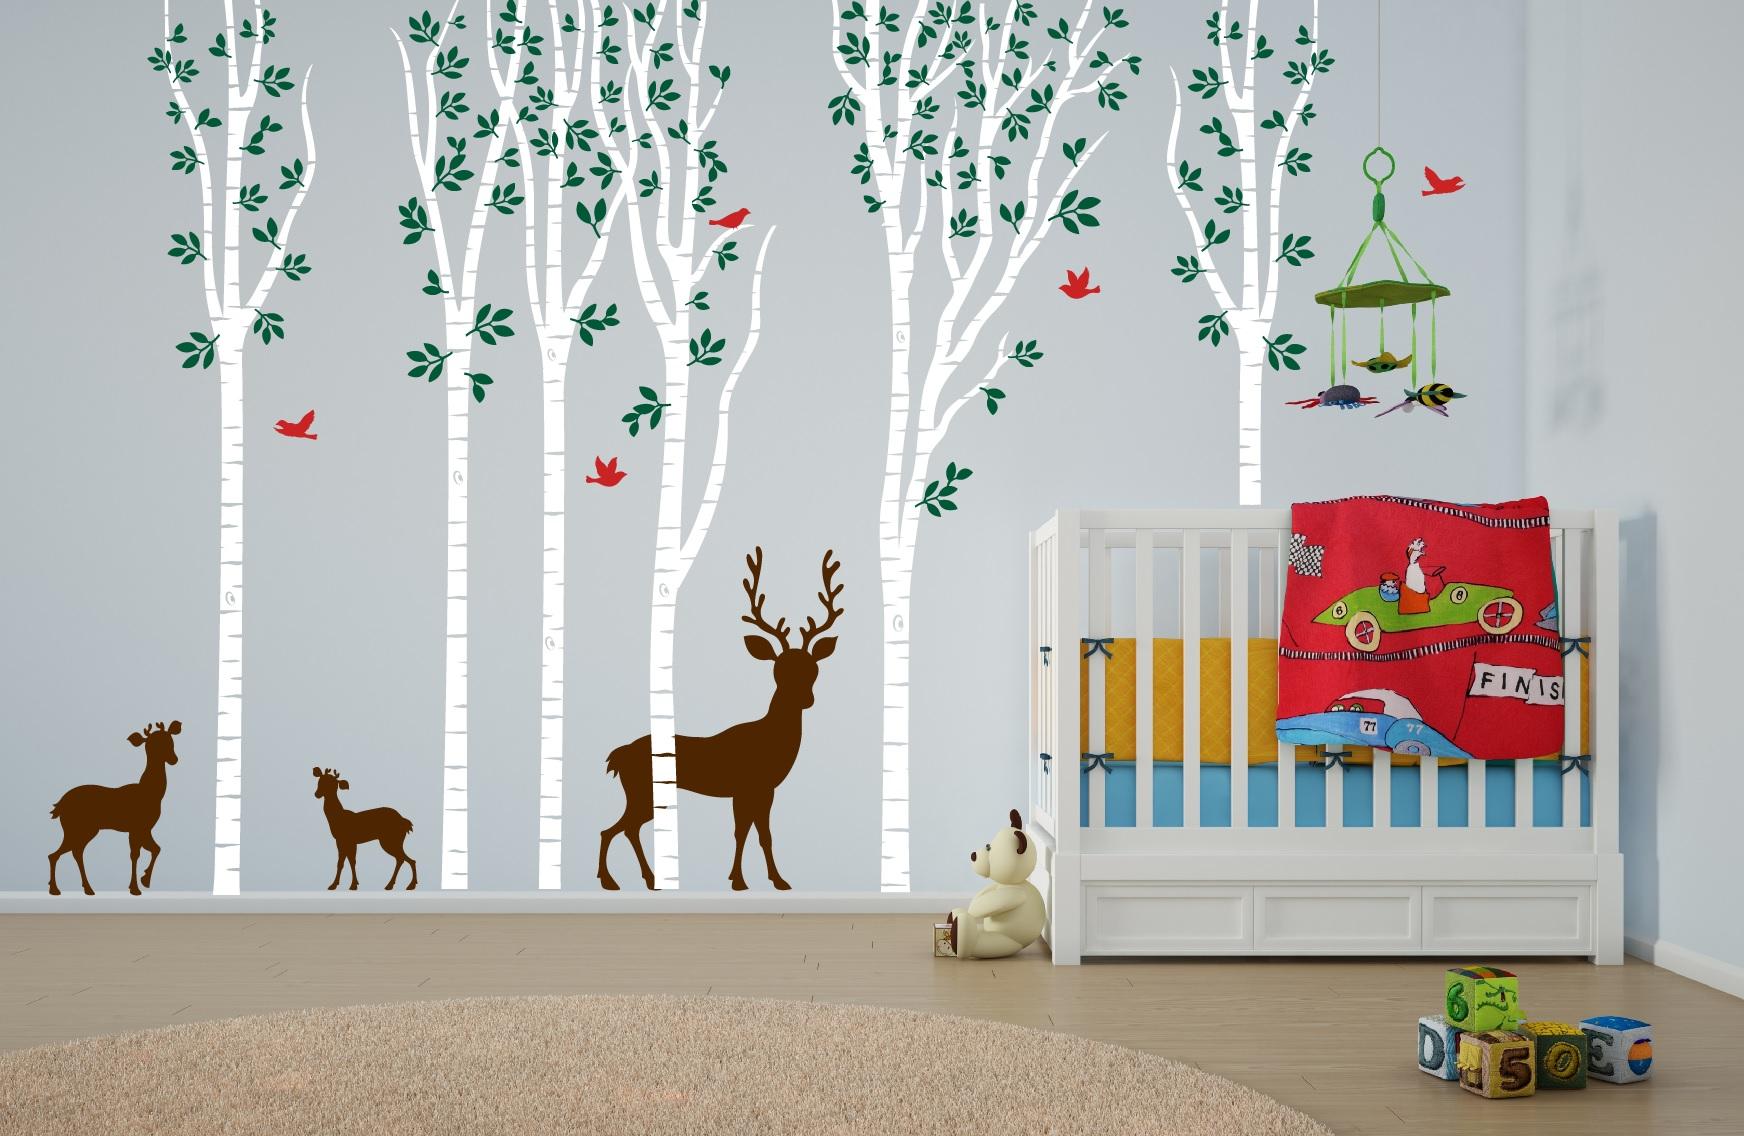 birch-tree-nursery-deer-set-birds.jpg